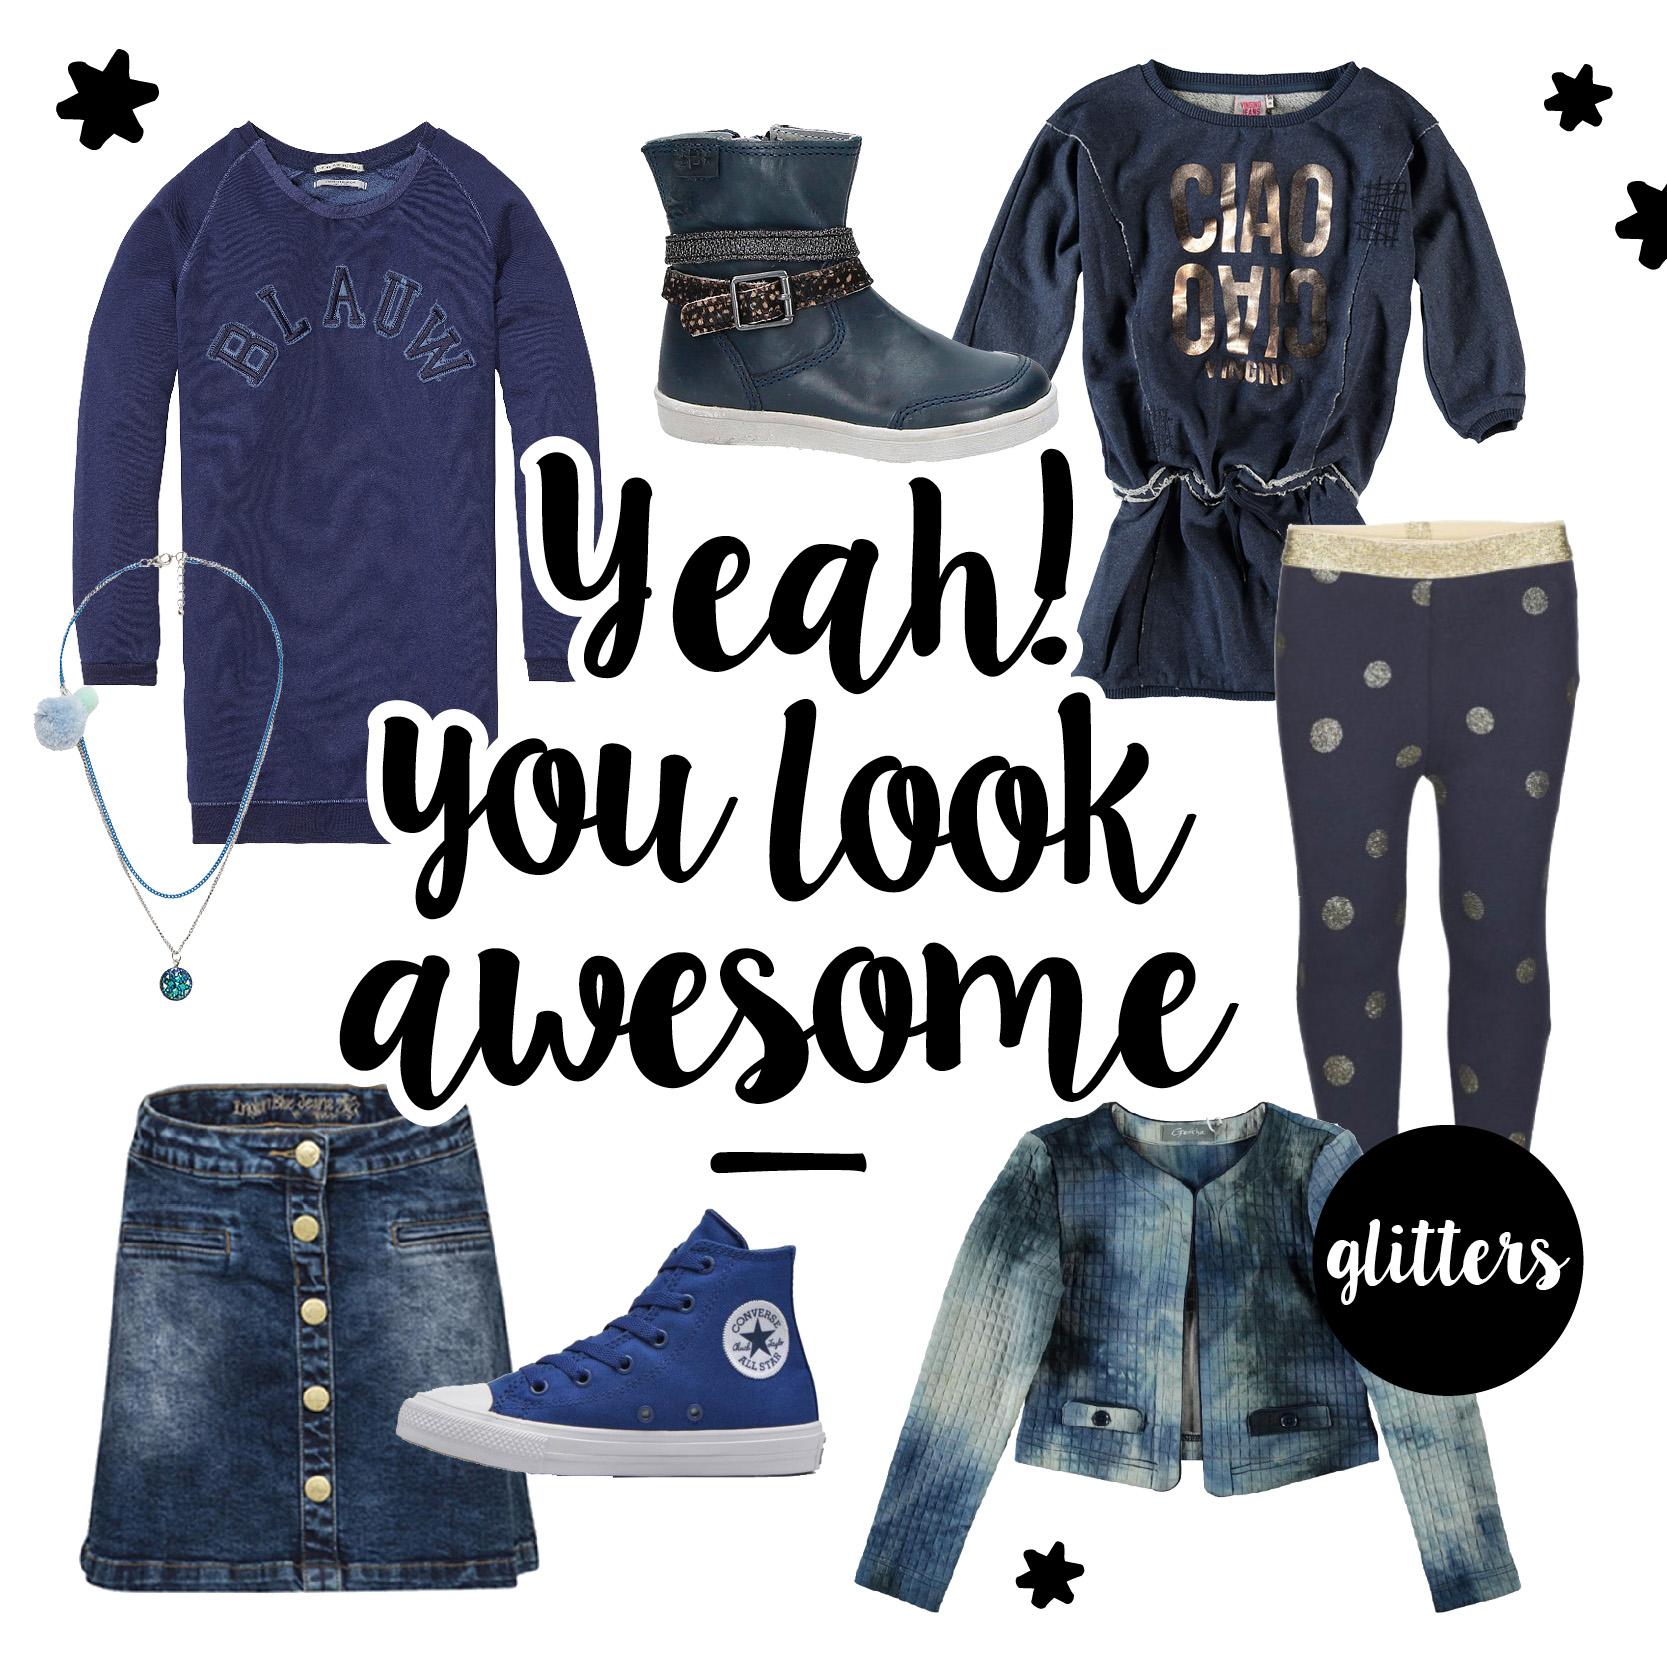 kinderkleding winter 2016-2017, hippe meisjeskleding, stoere meisjeskleding, kindermode styling